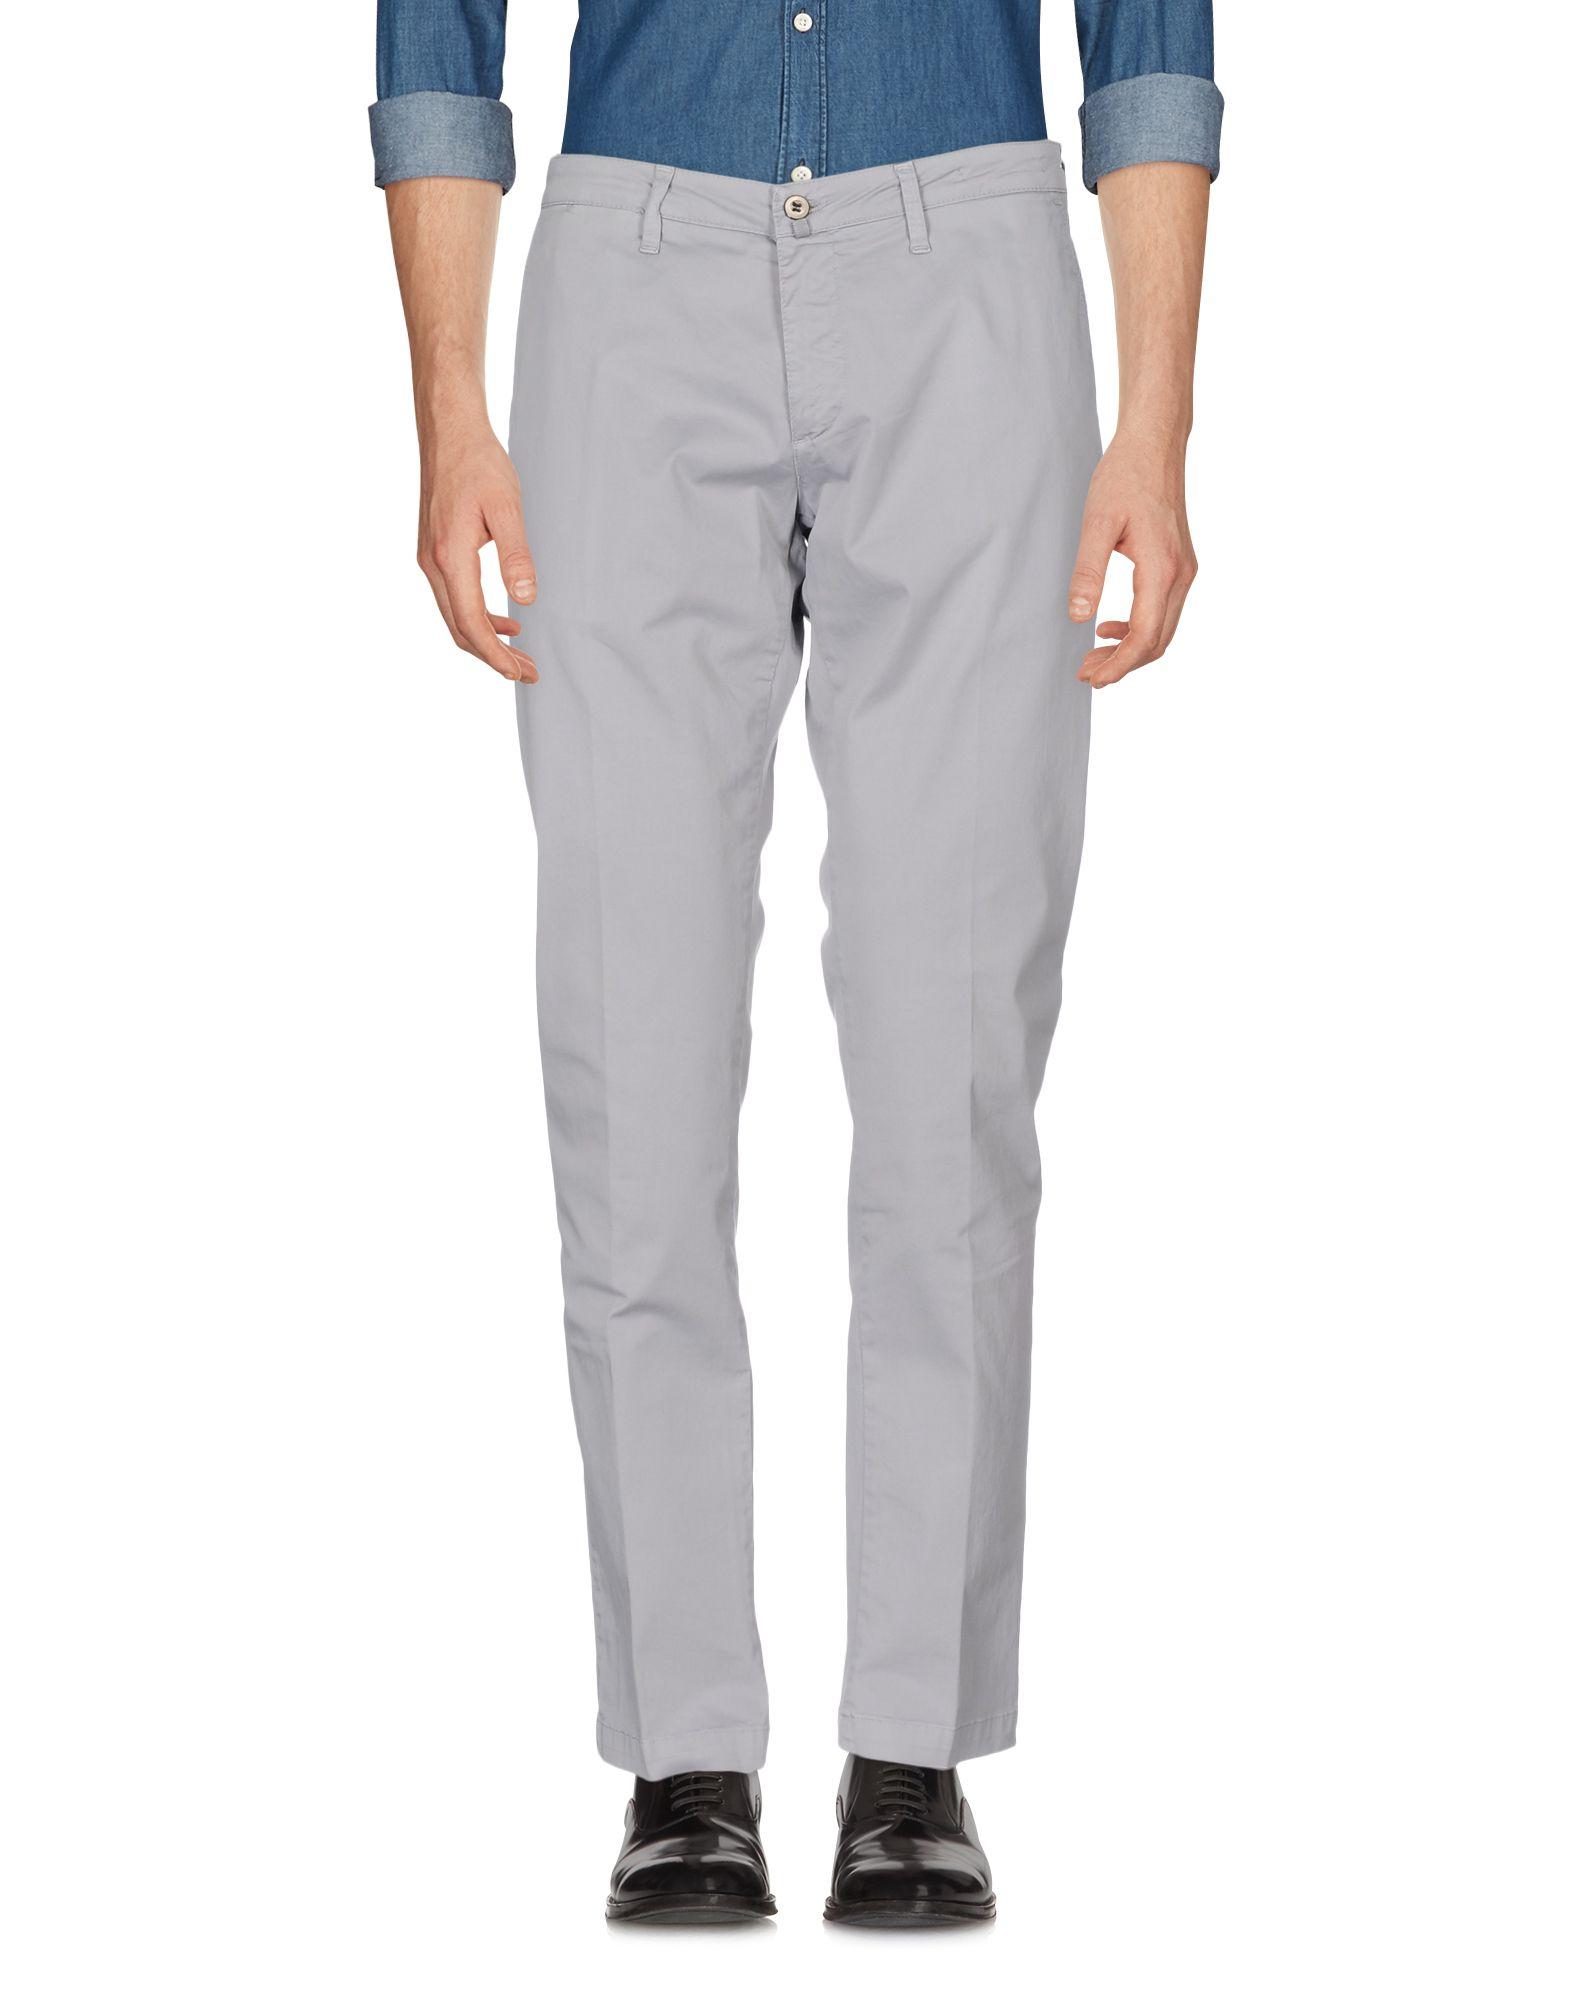 GALLERY Повседневные брюки soft gallery комбинезон soft gallery модель 27658323